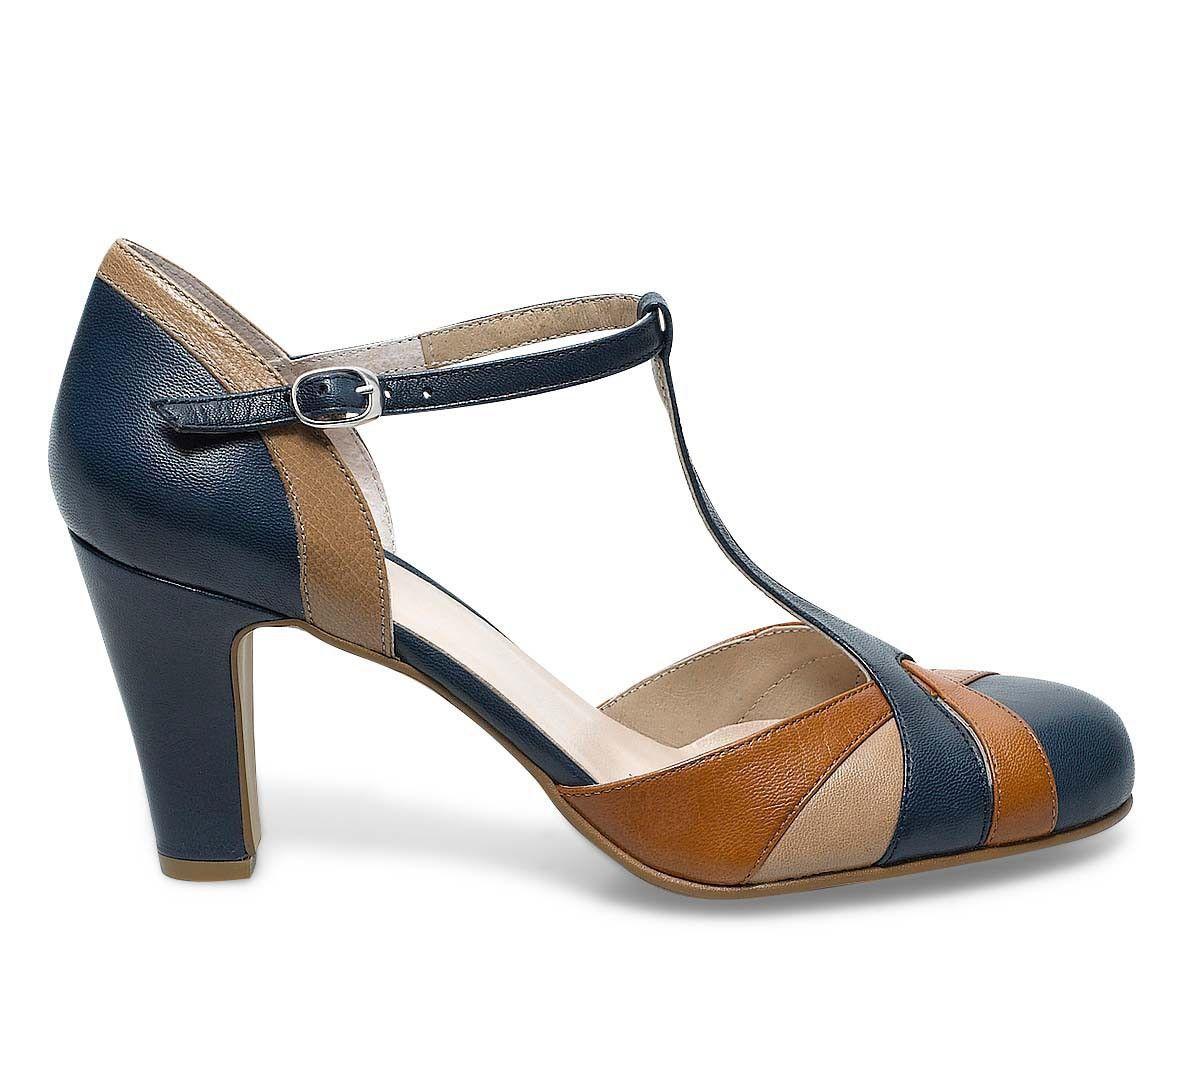 I love Eram   Chaussures   Pinterest   Sandales femme, Chaussure et ... 9bf236a72f36